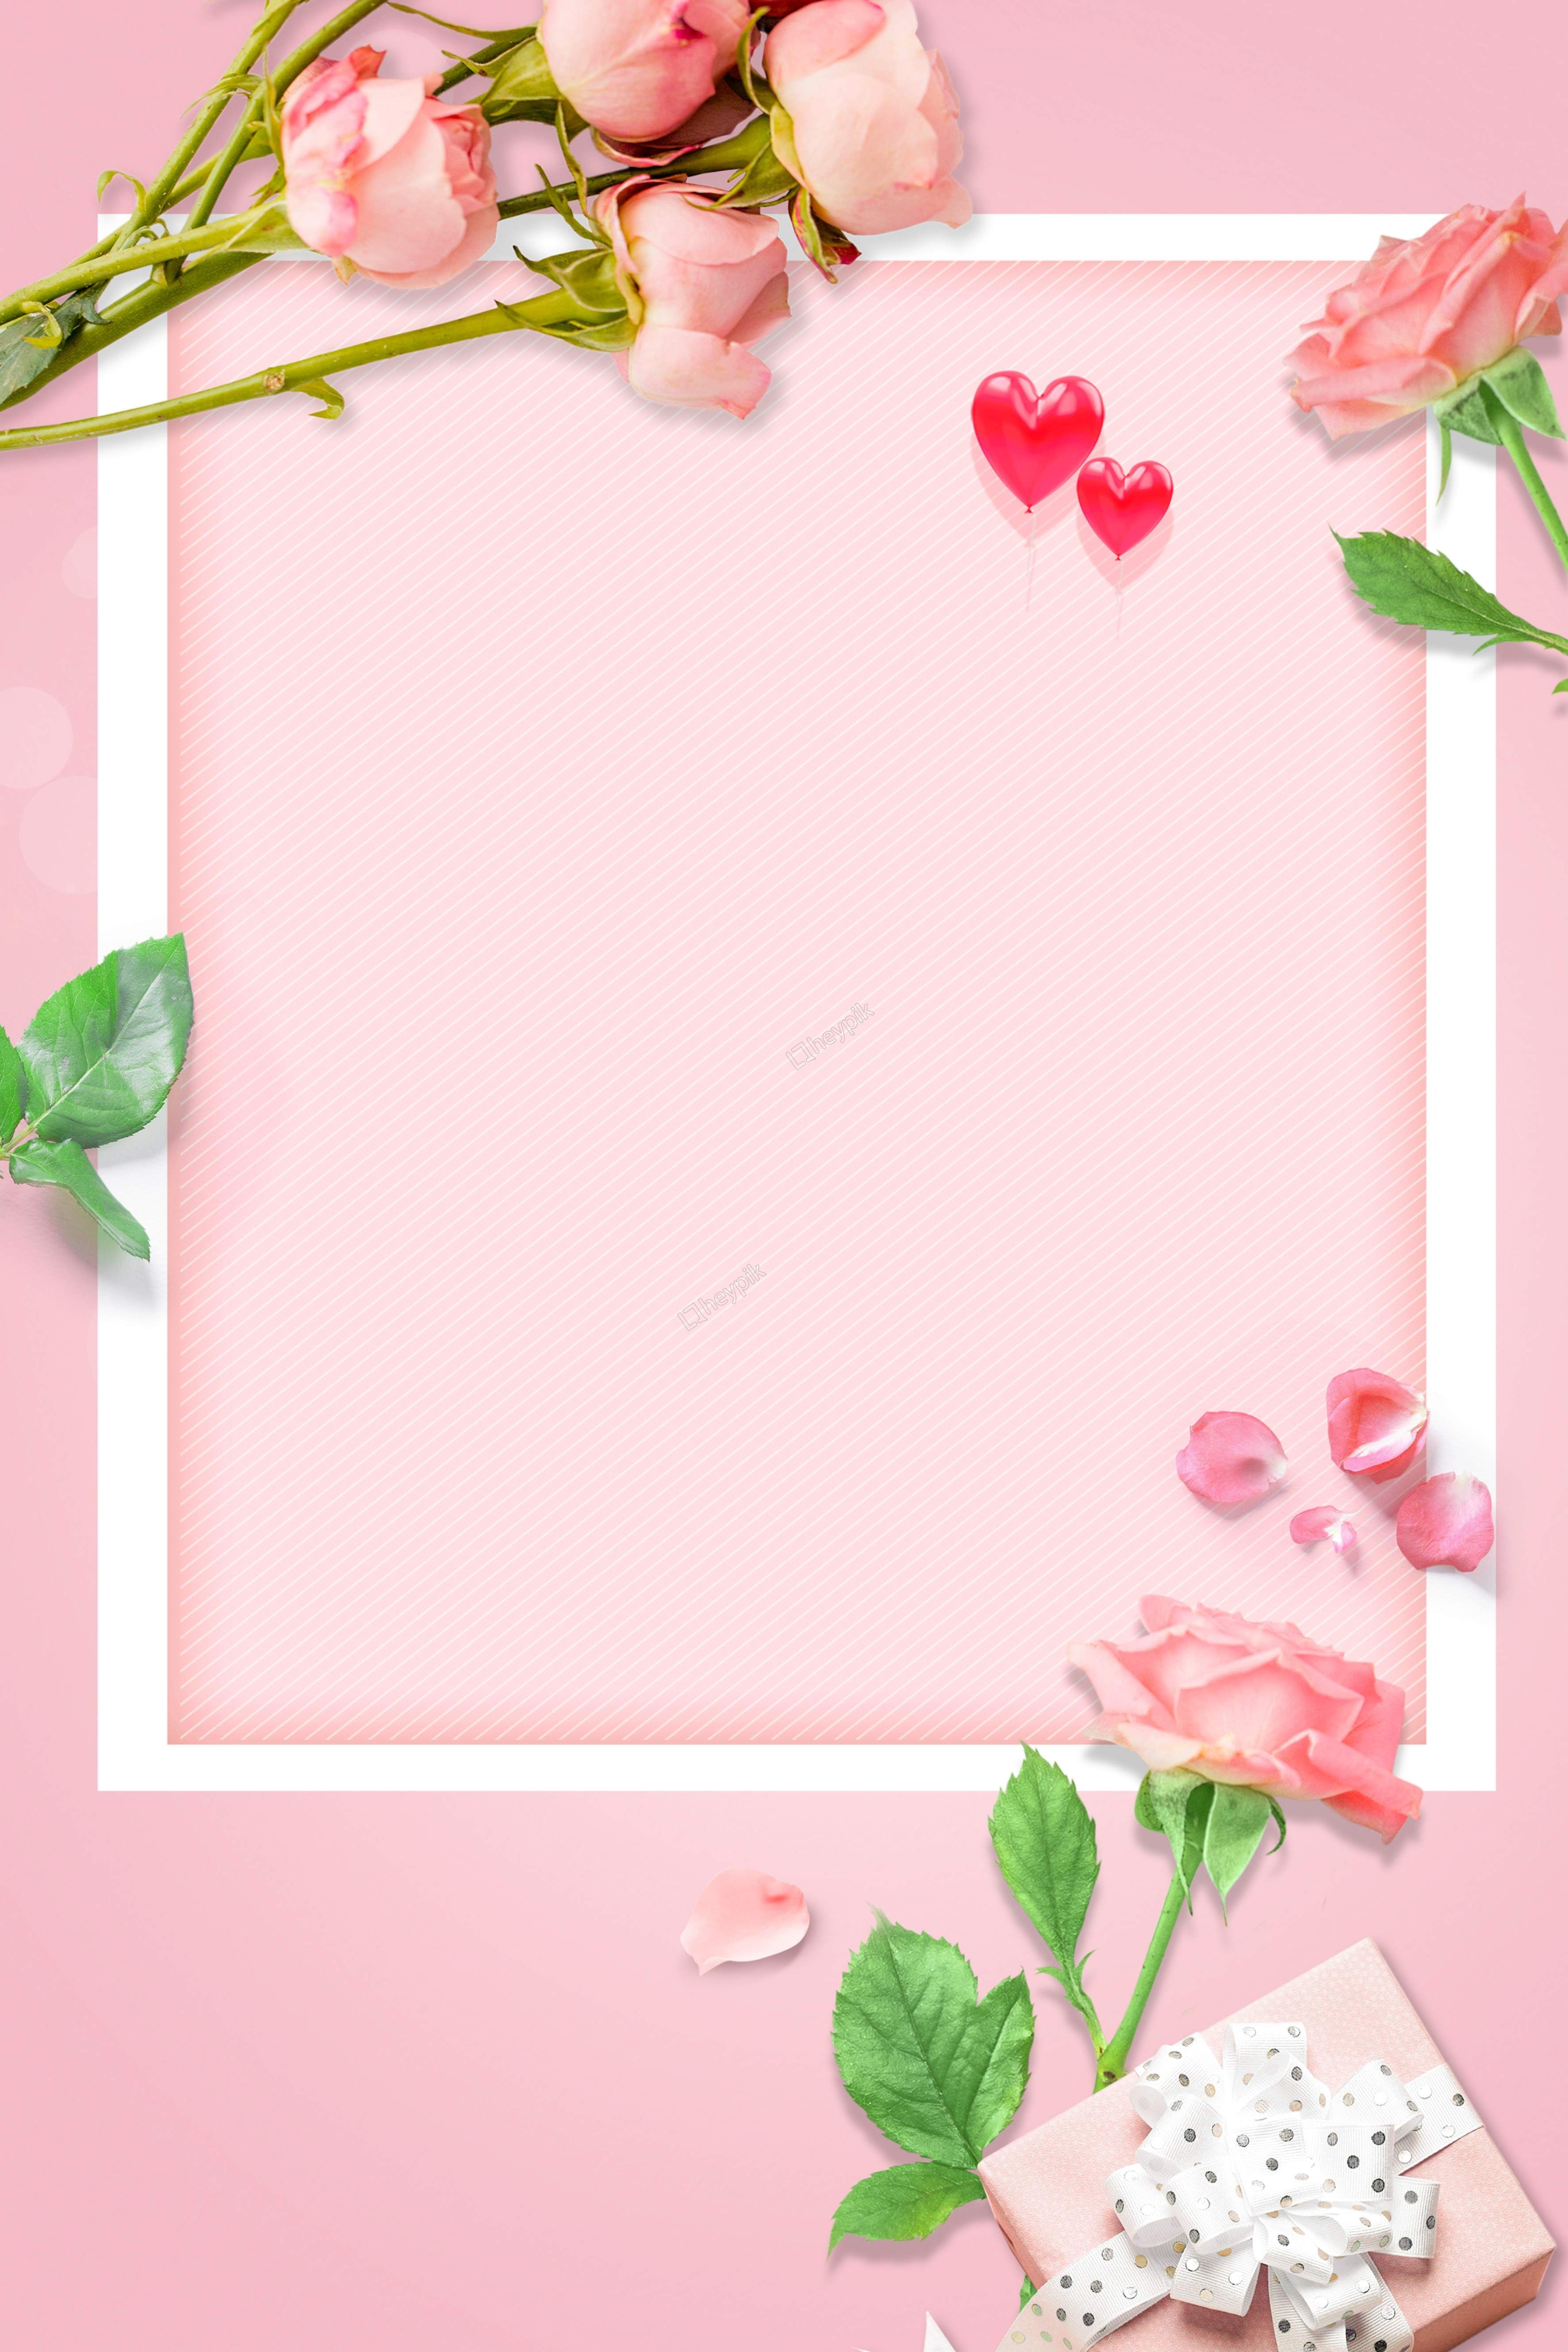 Love Carnations Love Border Pink Background Vector Floral Background Flower Background Wallpaper Flower Background Images